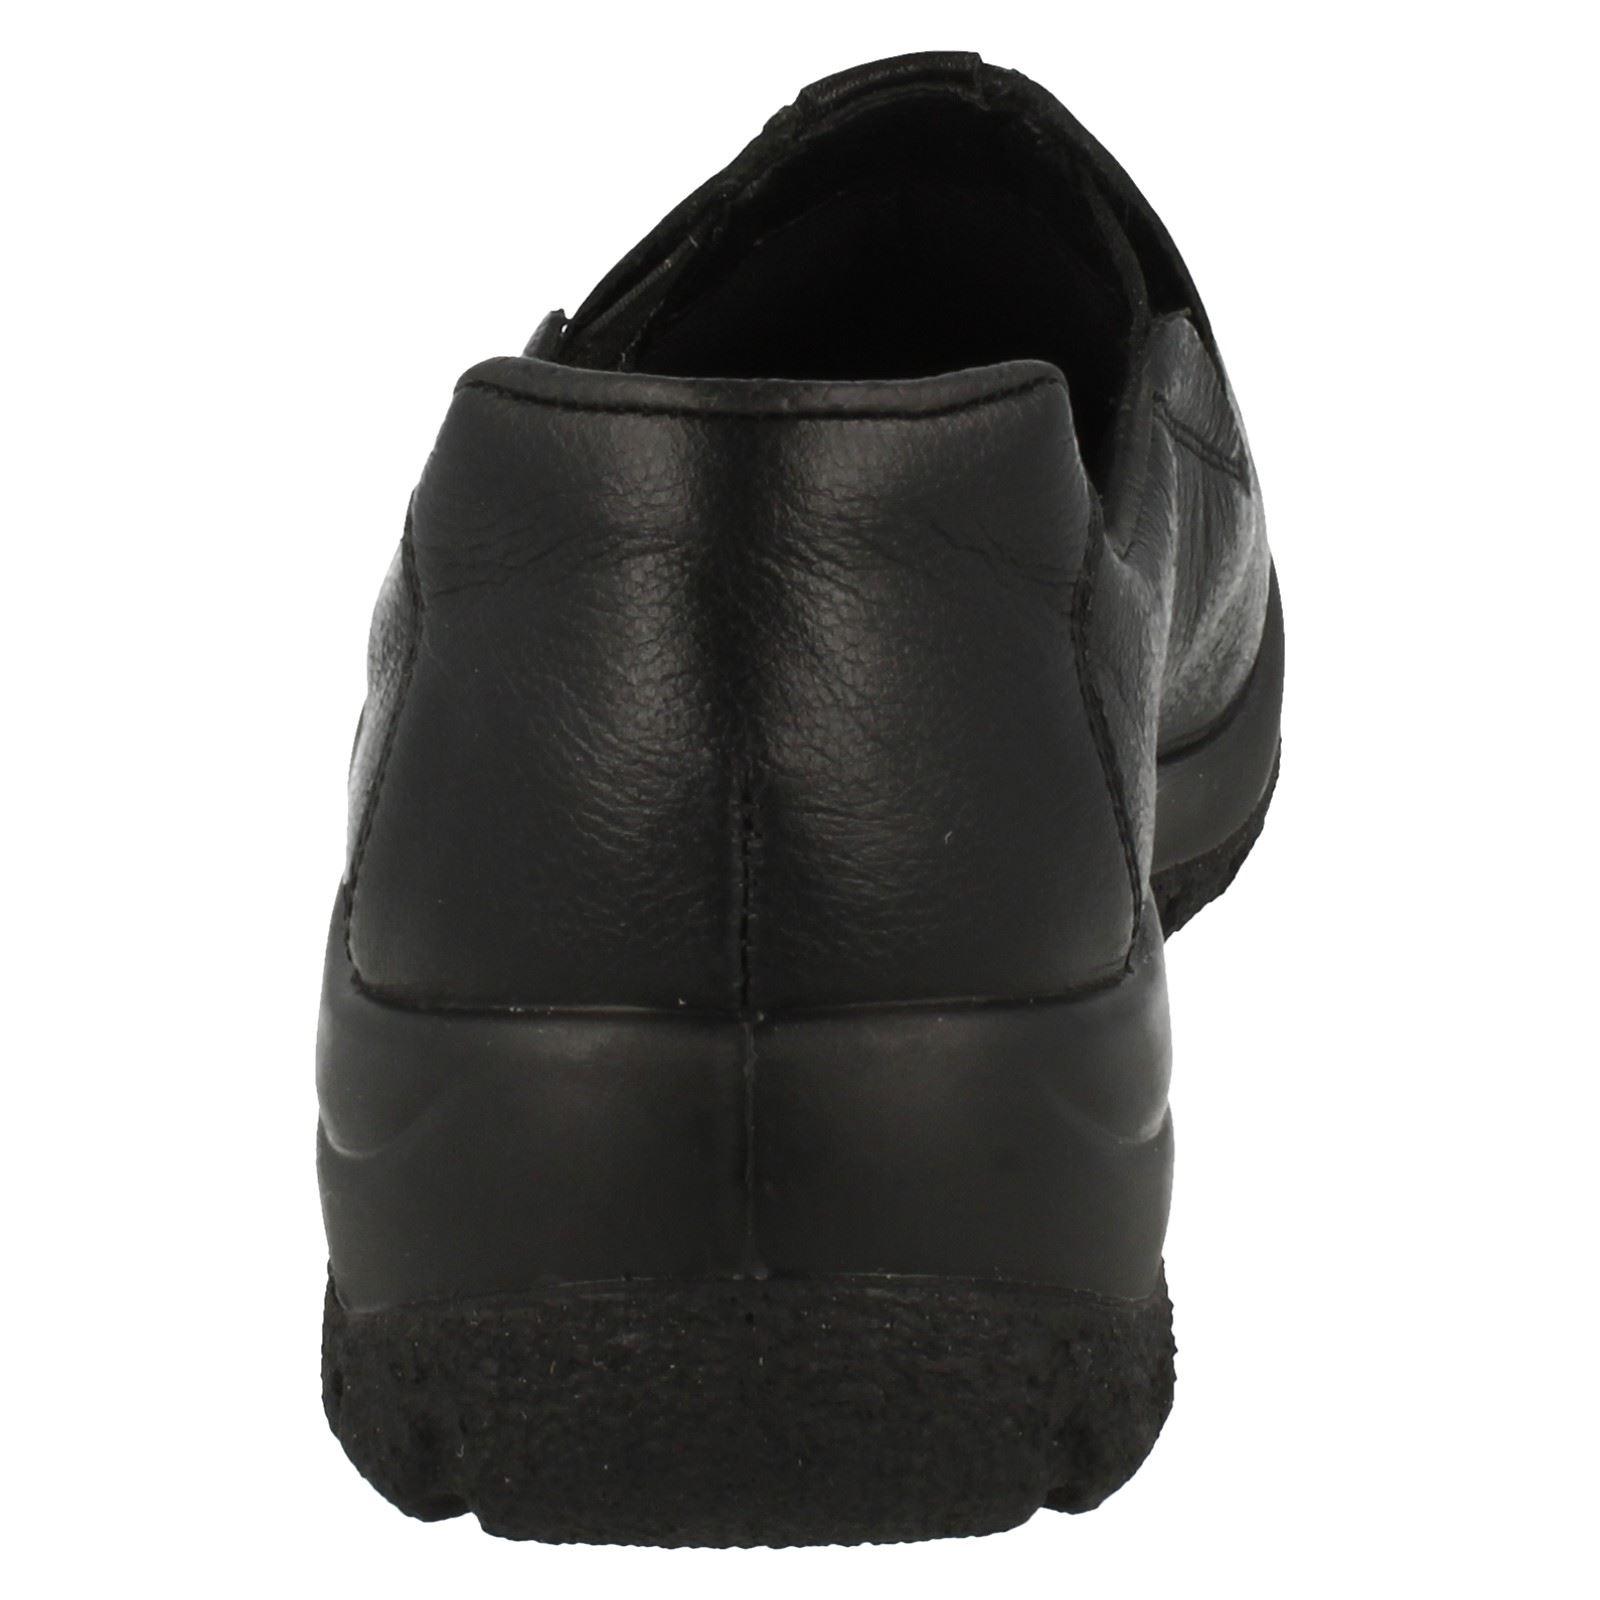 Schwarz Damen Antistress Rieker Schuhe Casual 'l7153' q4rqFzfg